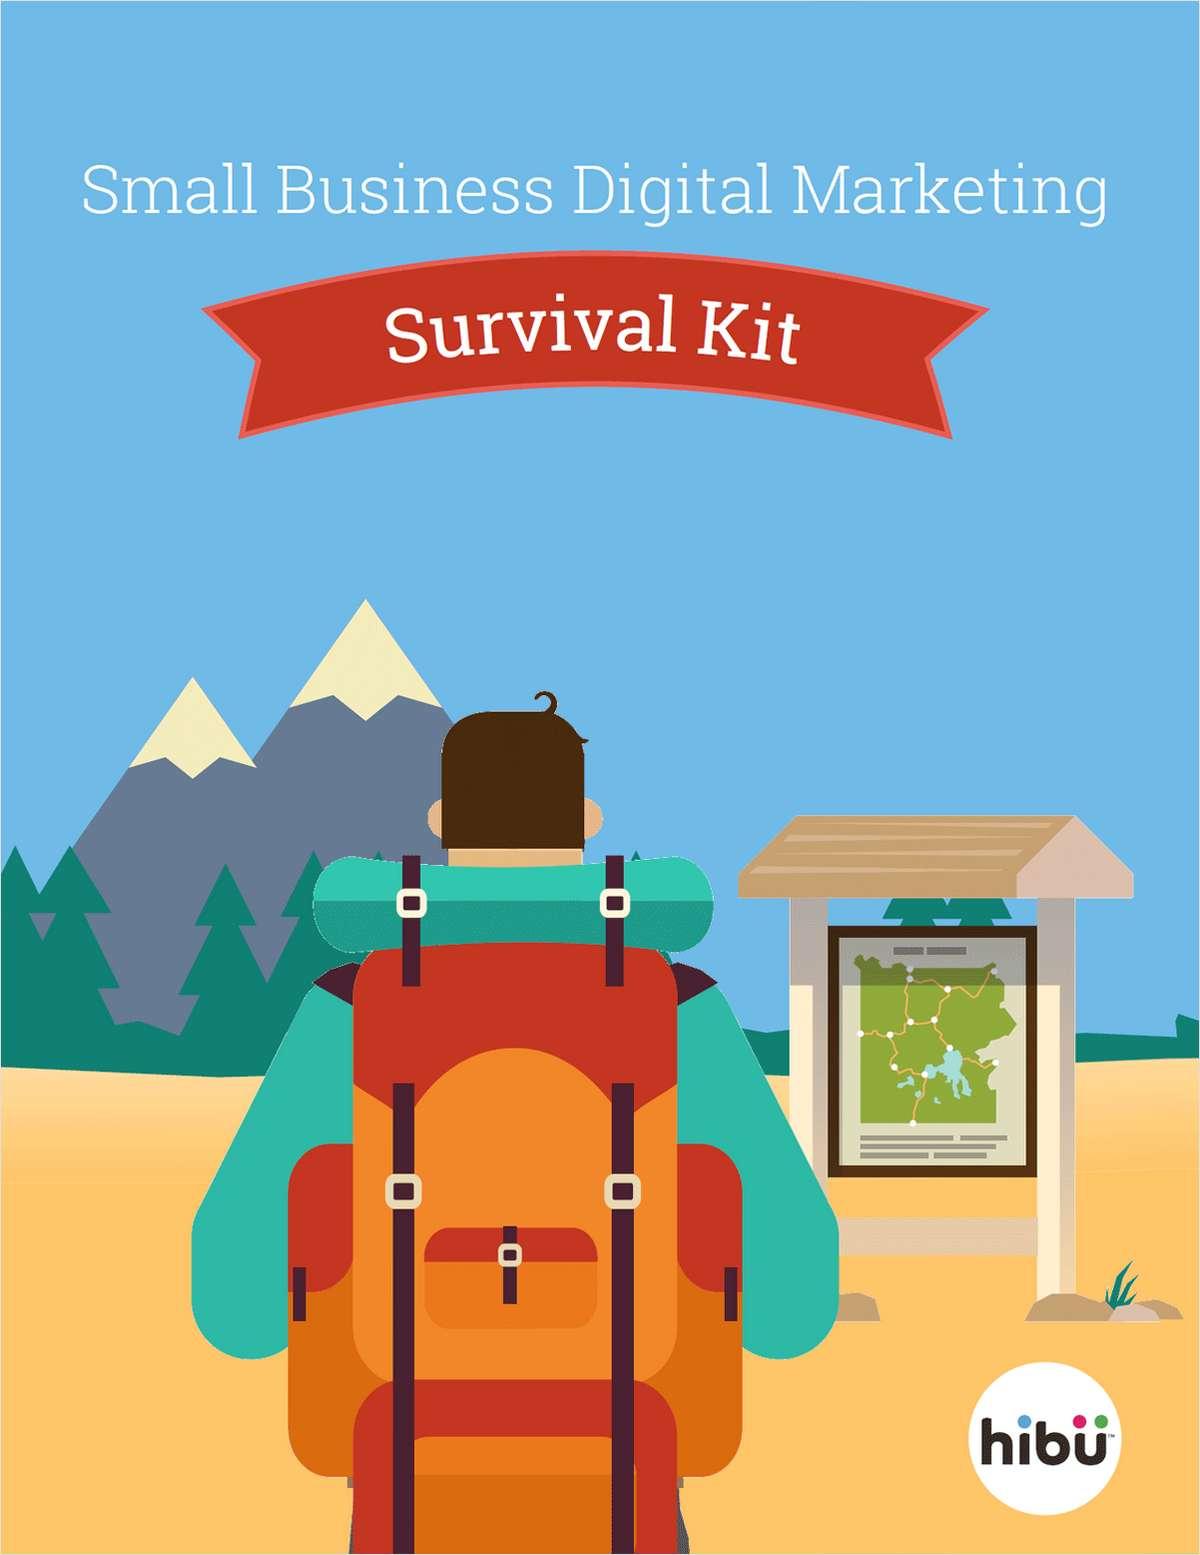 Small Business Digital Marketing Survival Kit